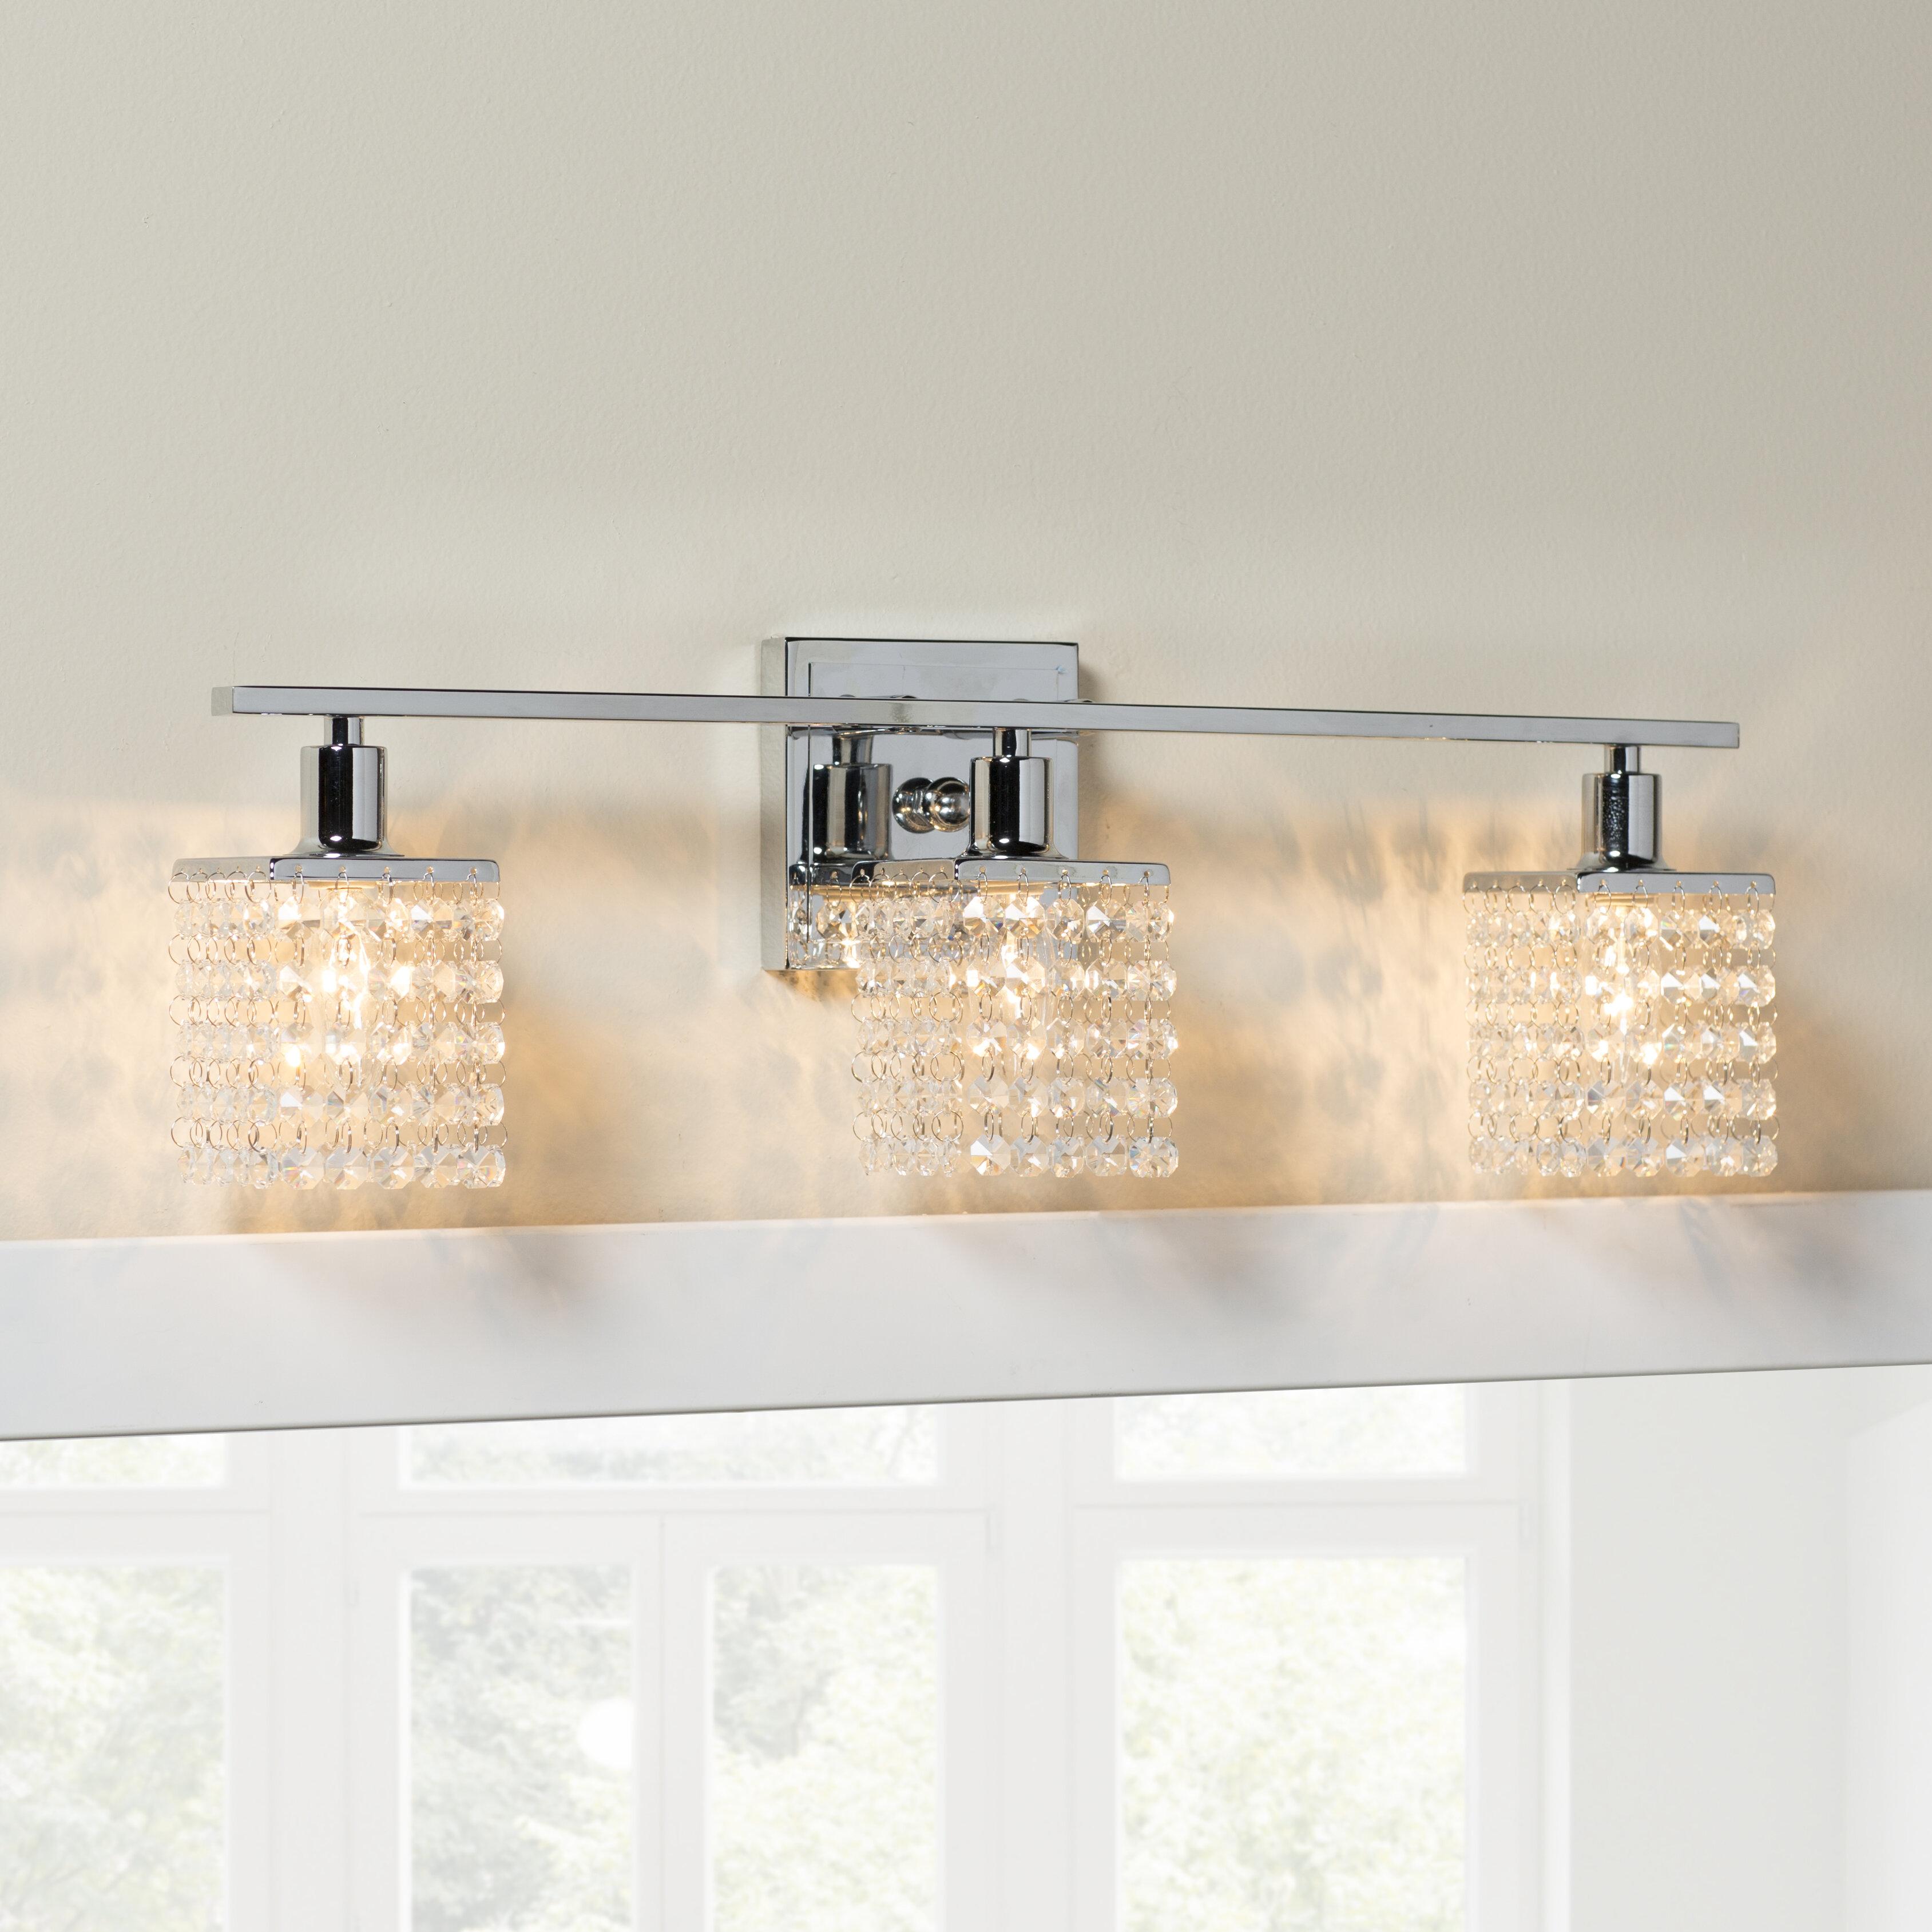 Mckissick 10-Light Dimmable Chrome Vanity Light